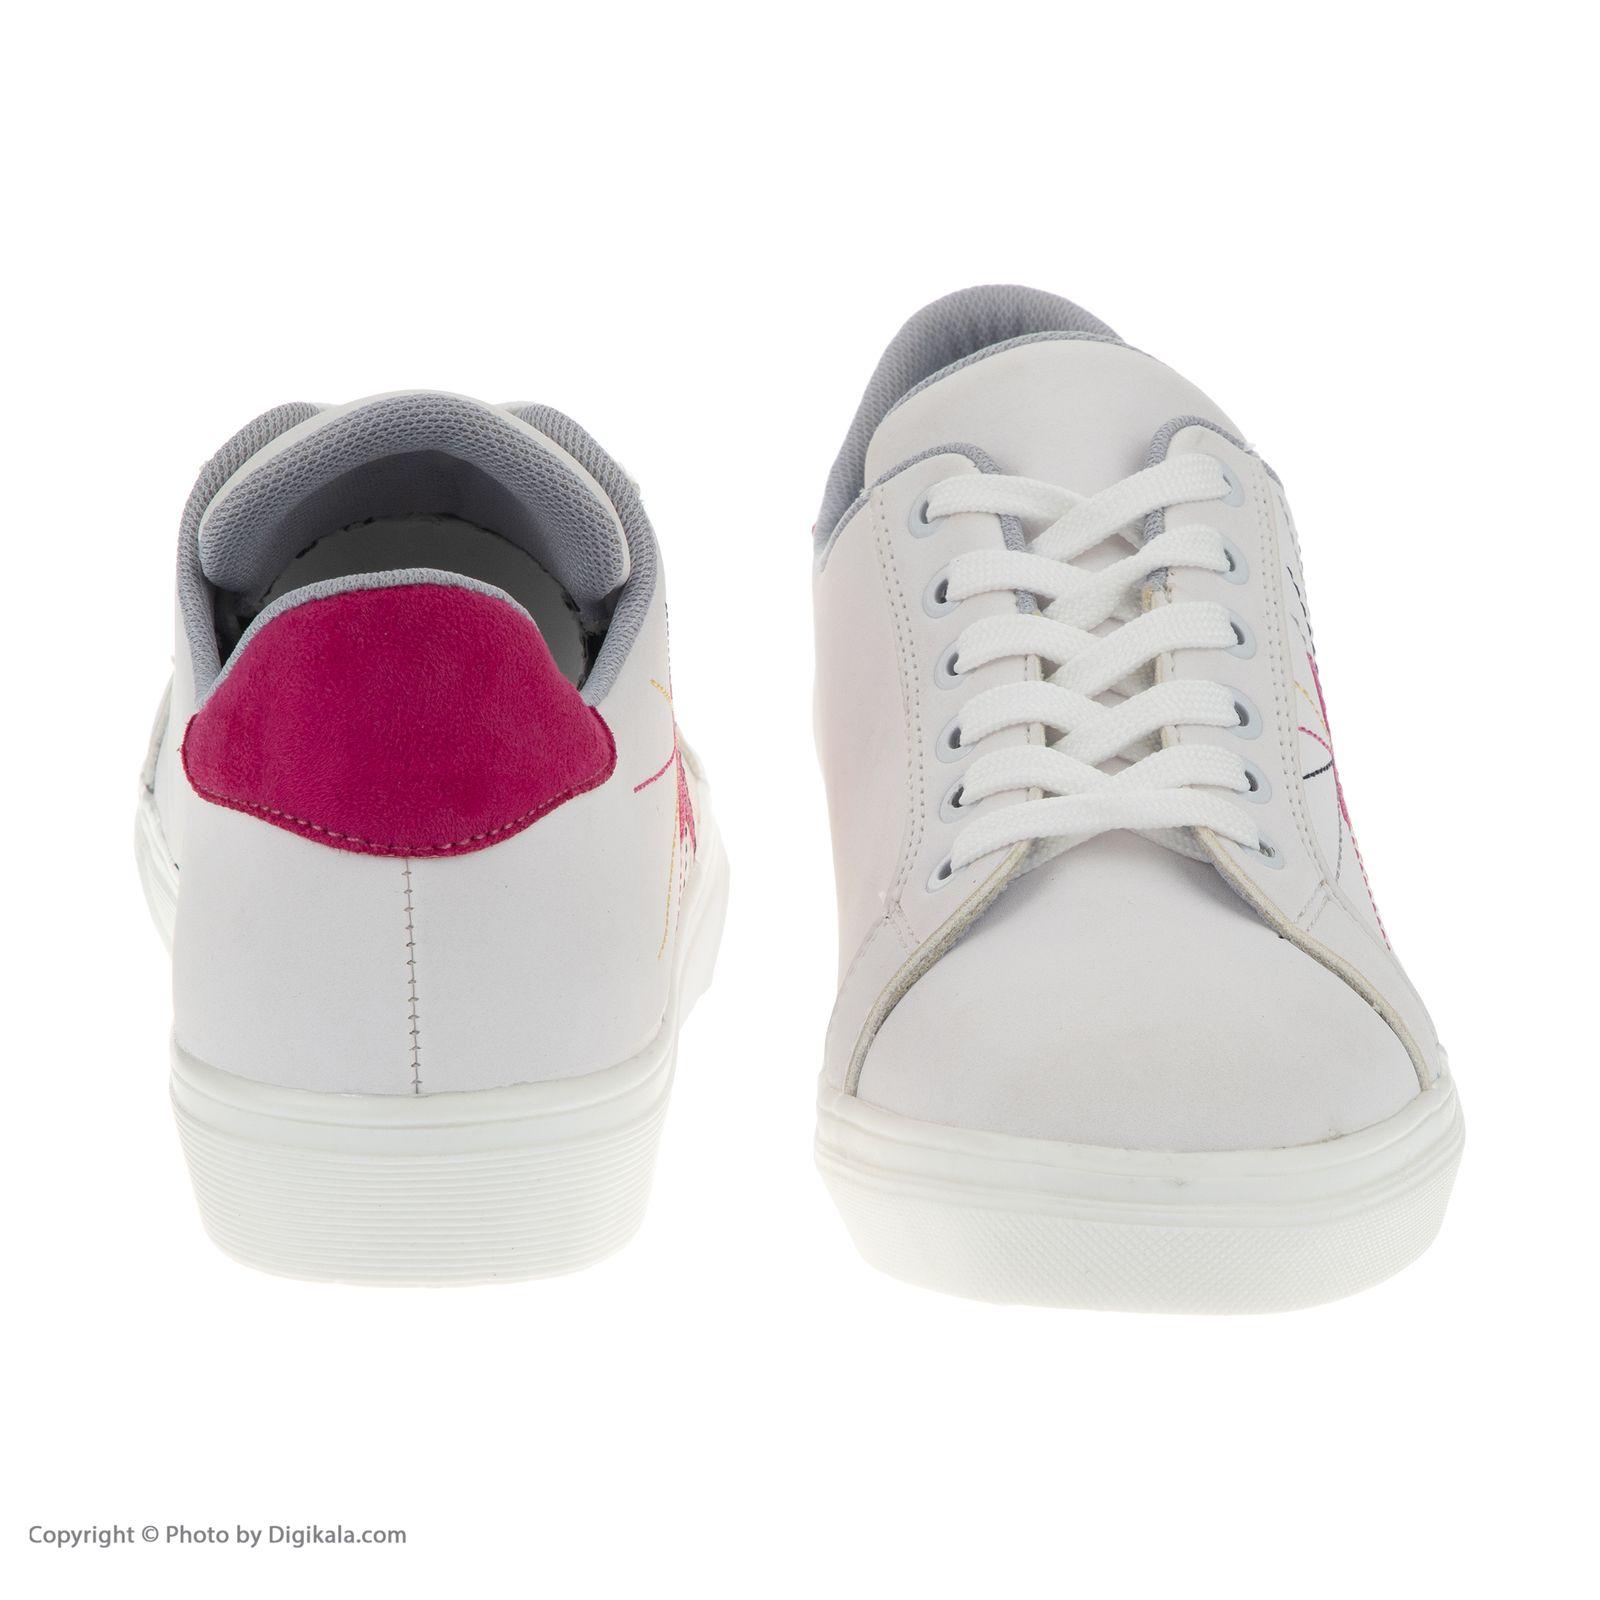 کفش روزمره زنانه مدل 4022 -  - 5